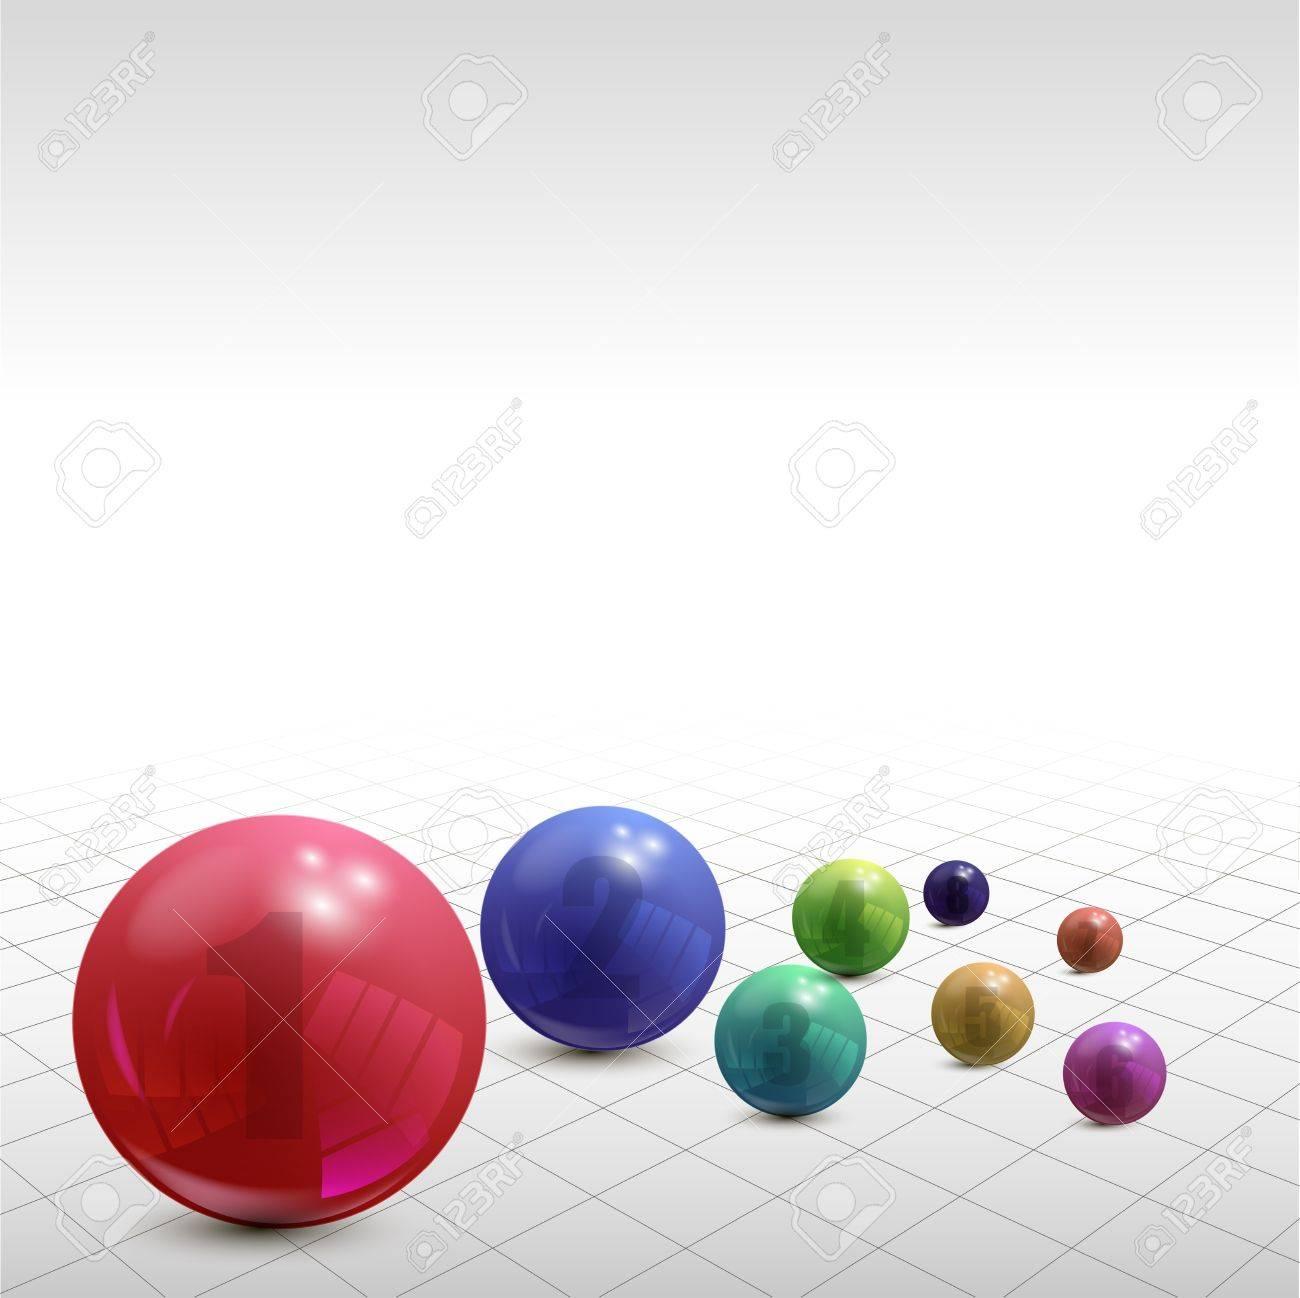 Set of colorful balls on white background, illustration Stock Vector - 18526057